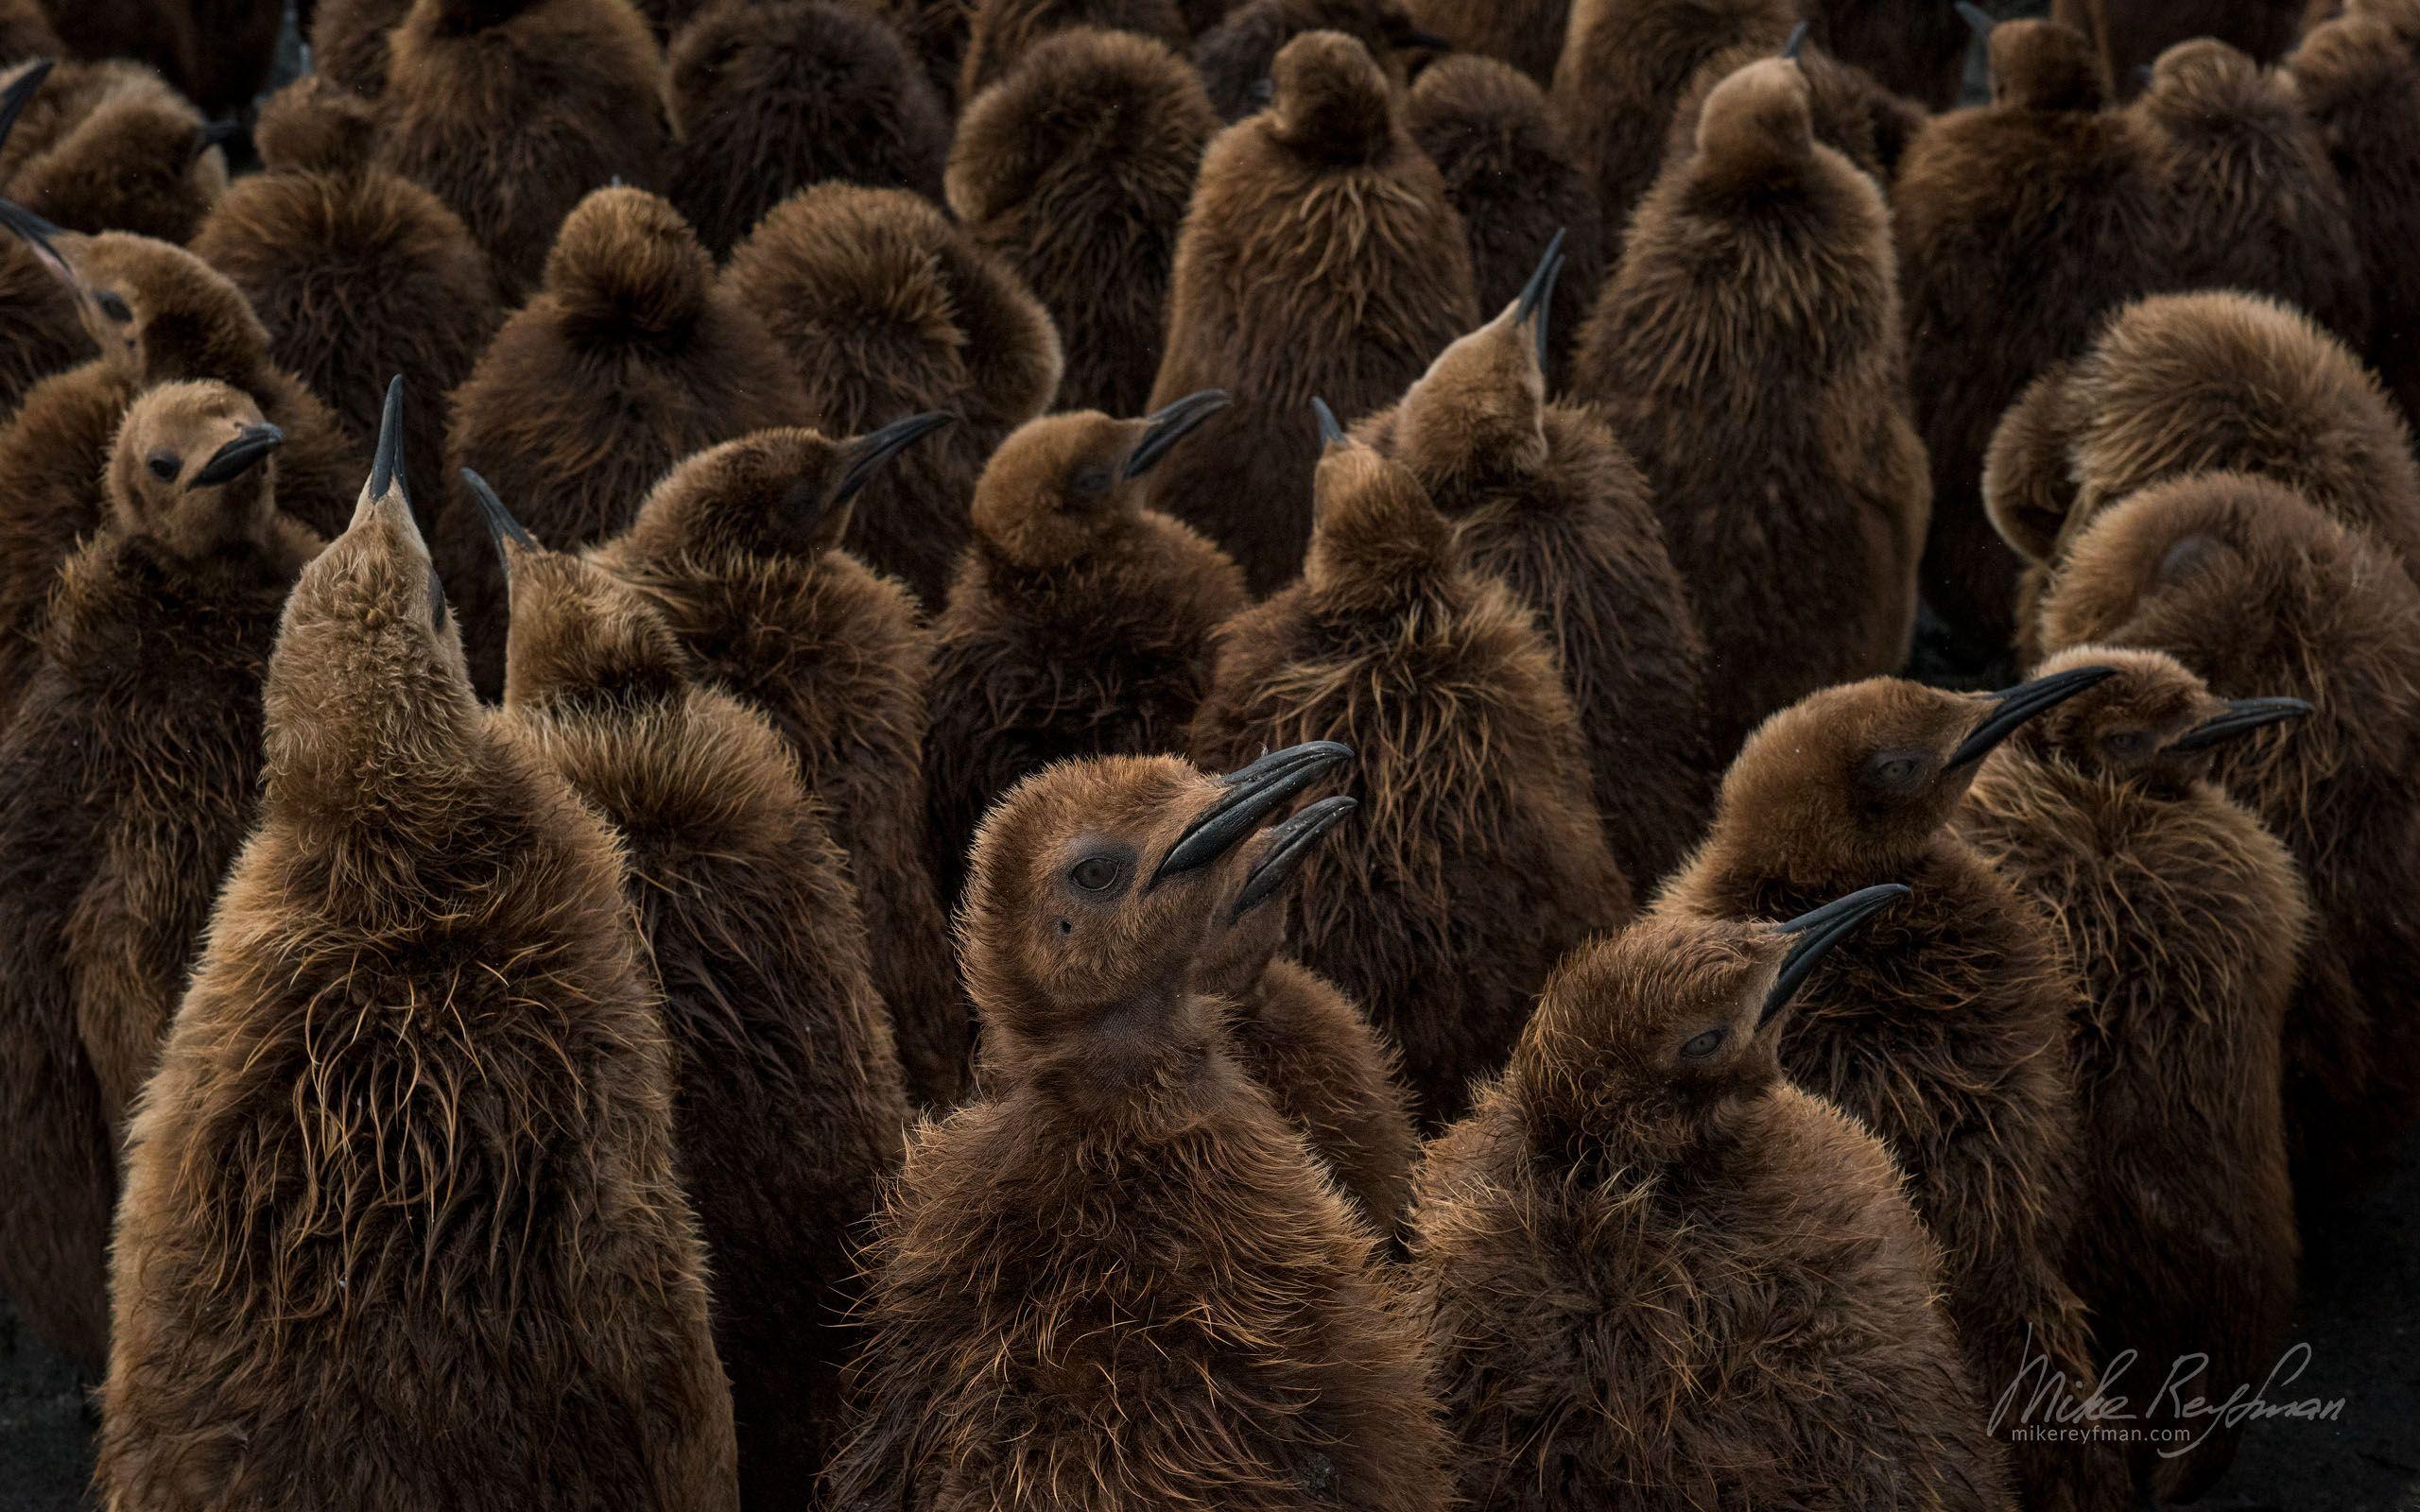 south georgia island, animal behavior, wildlife, animals in the wild, beach, south georgia, king penguin, salisbury plain, chicks, creche, rookery, Майк Рейфман